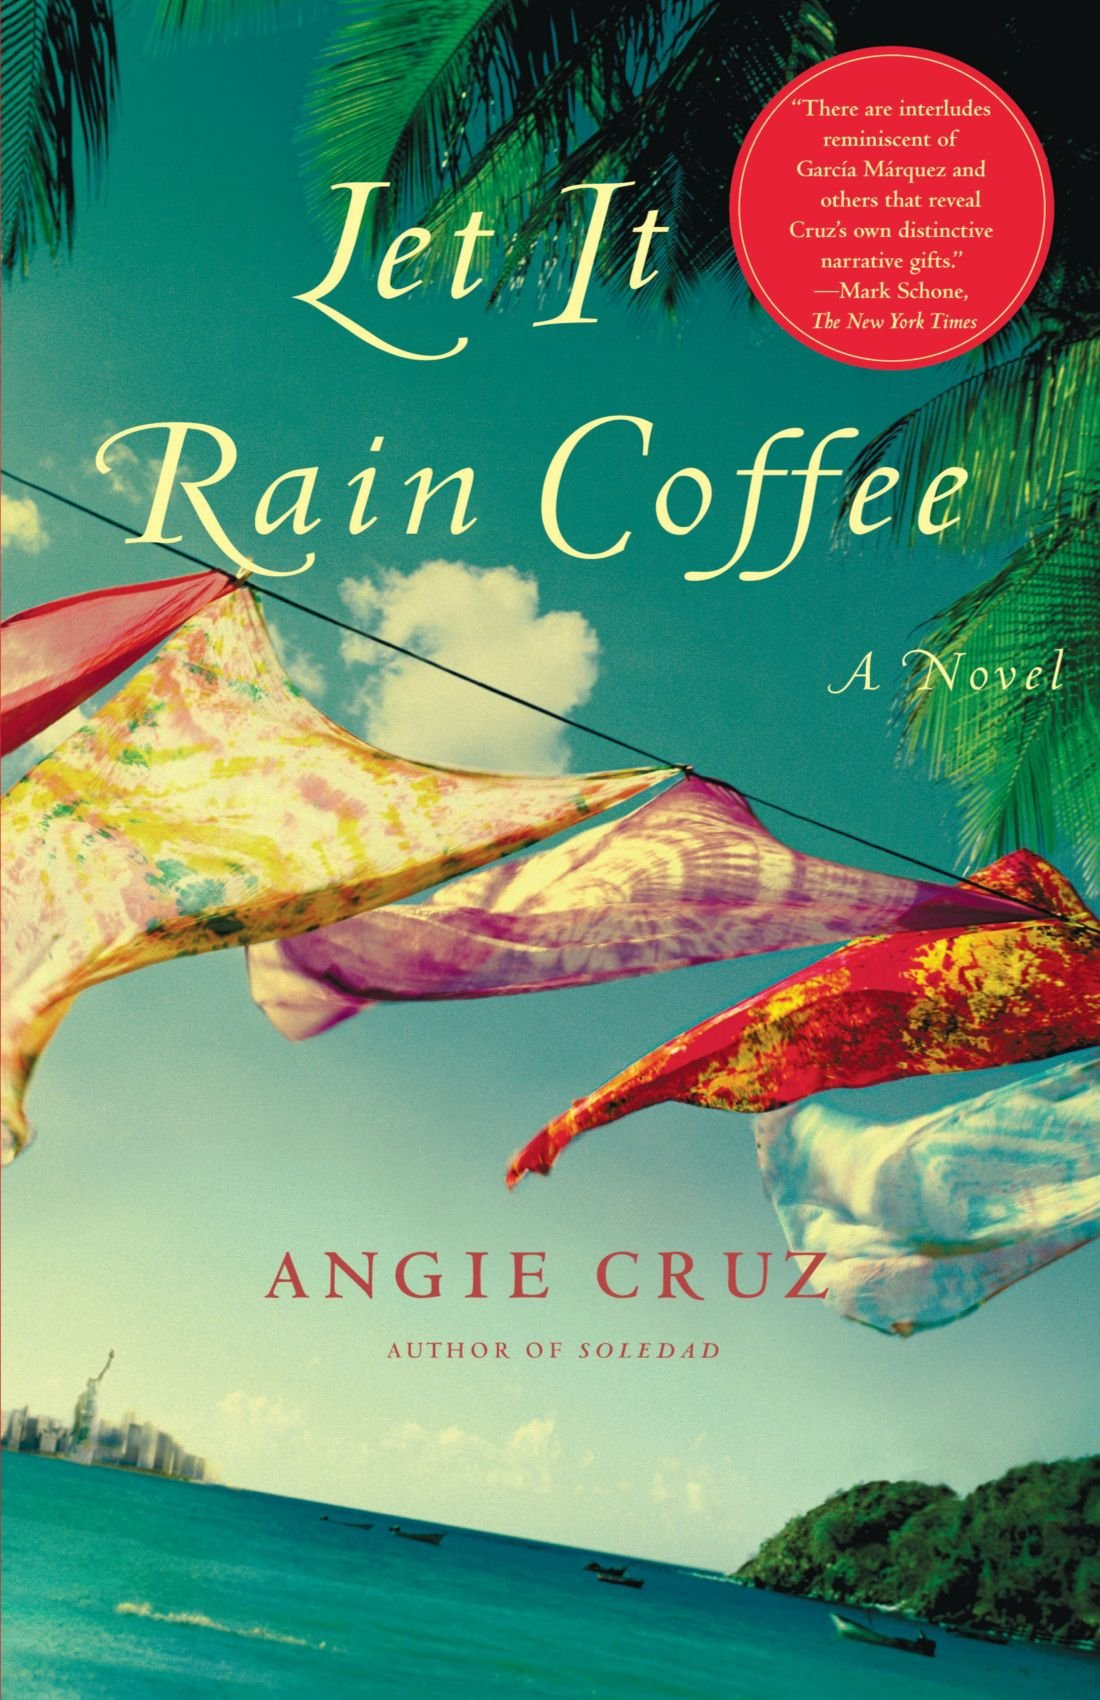 Let It Rain Coffee: A Novel: Cruz, Angie: 9780743212045: Amazon.com: Books